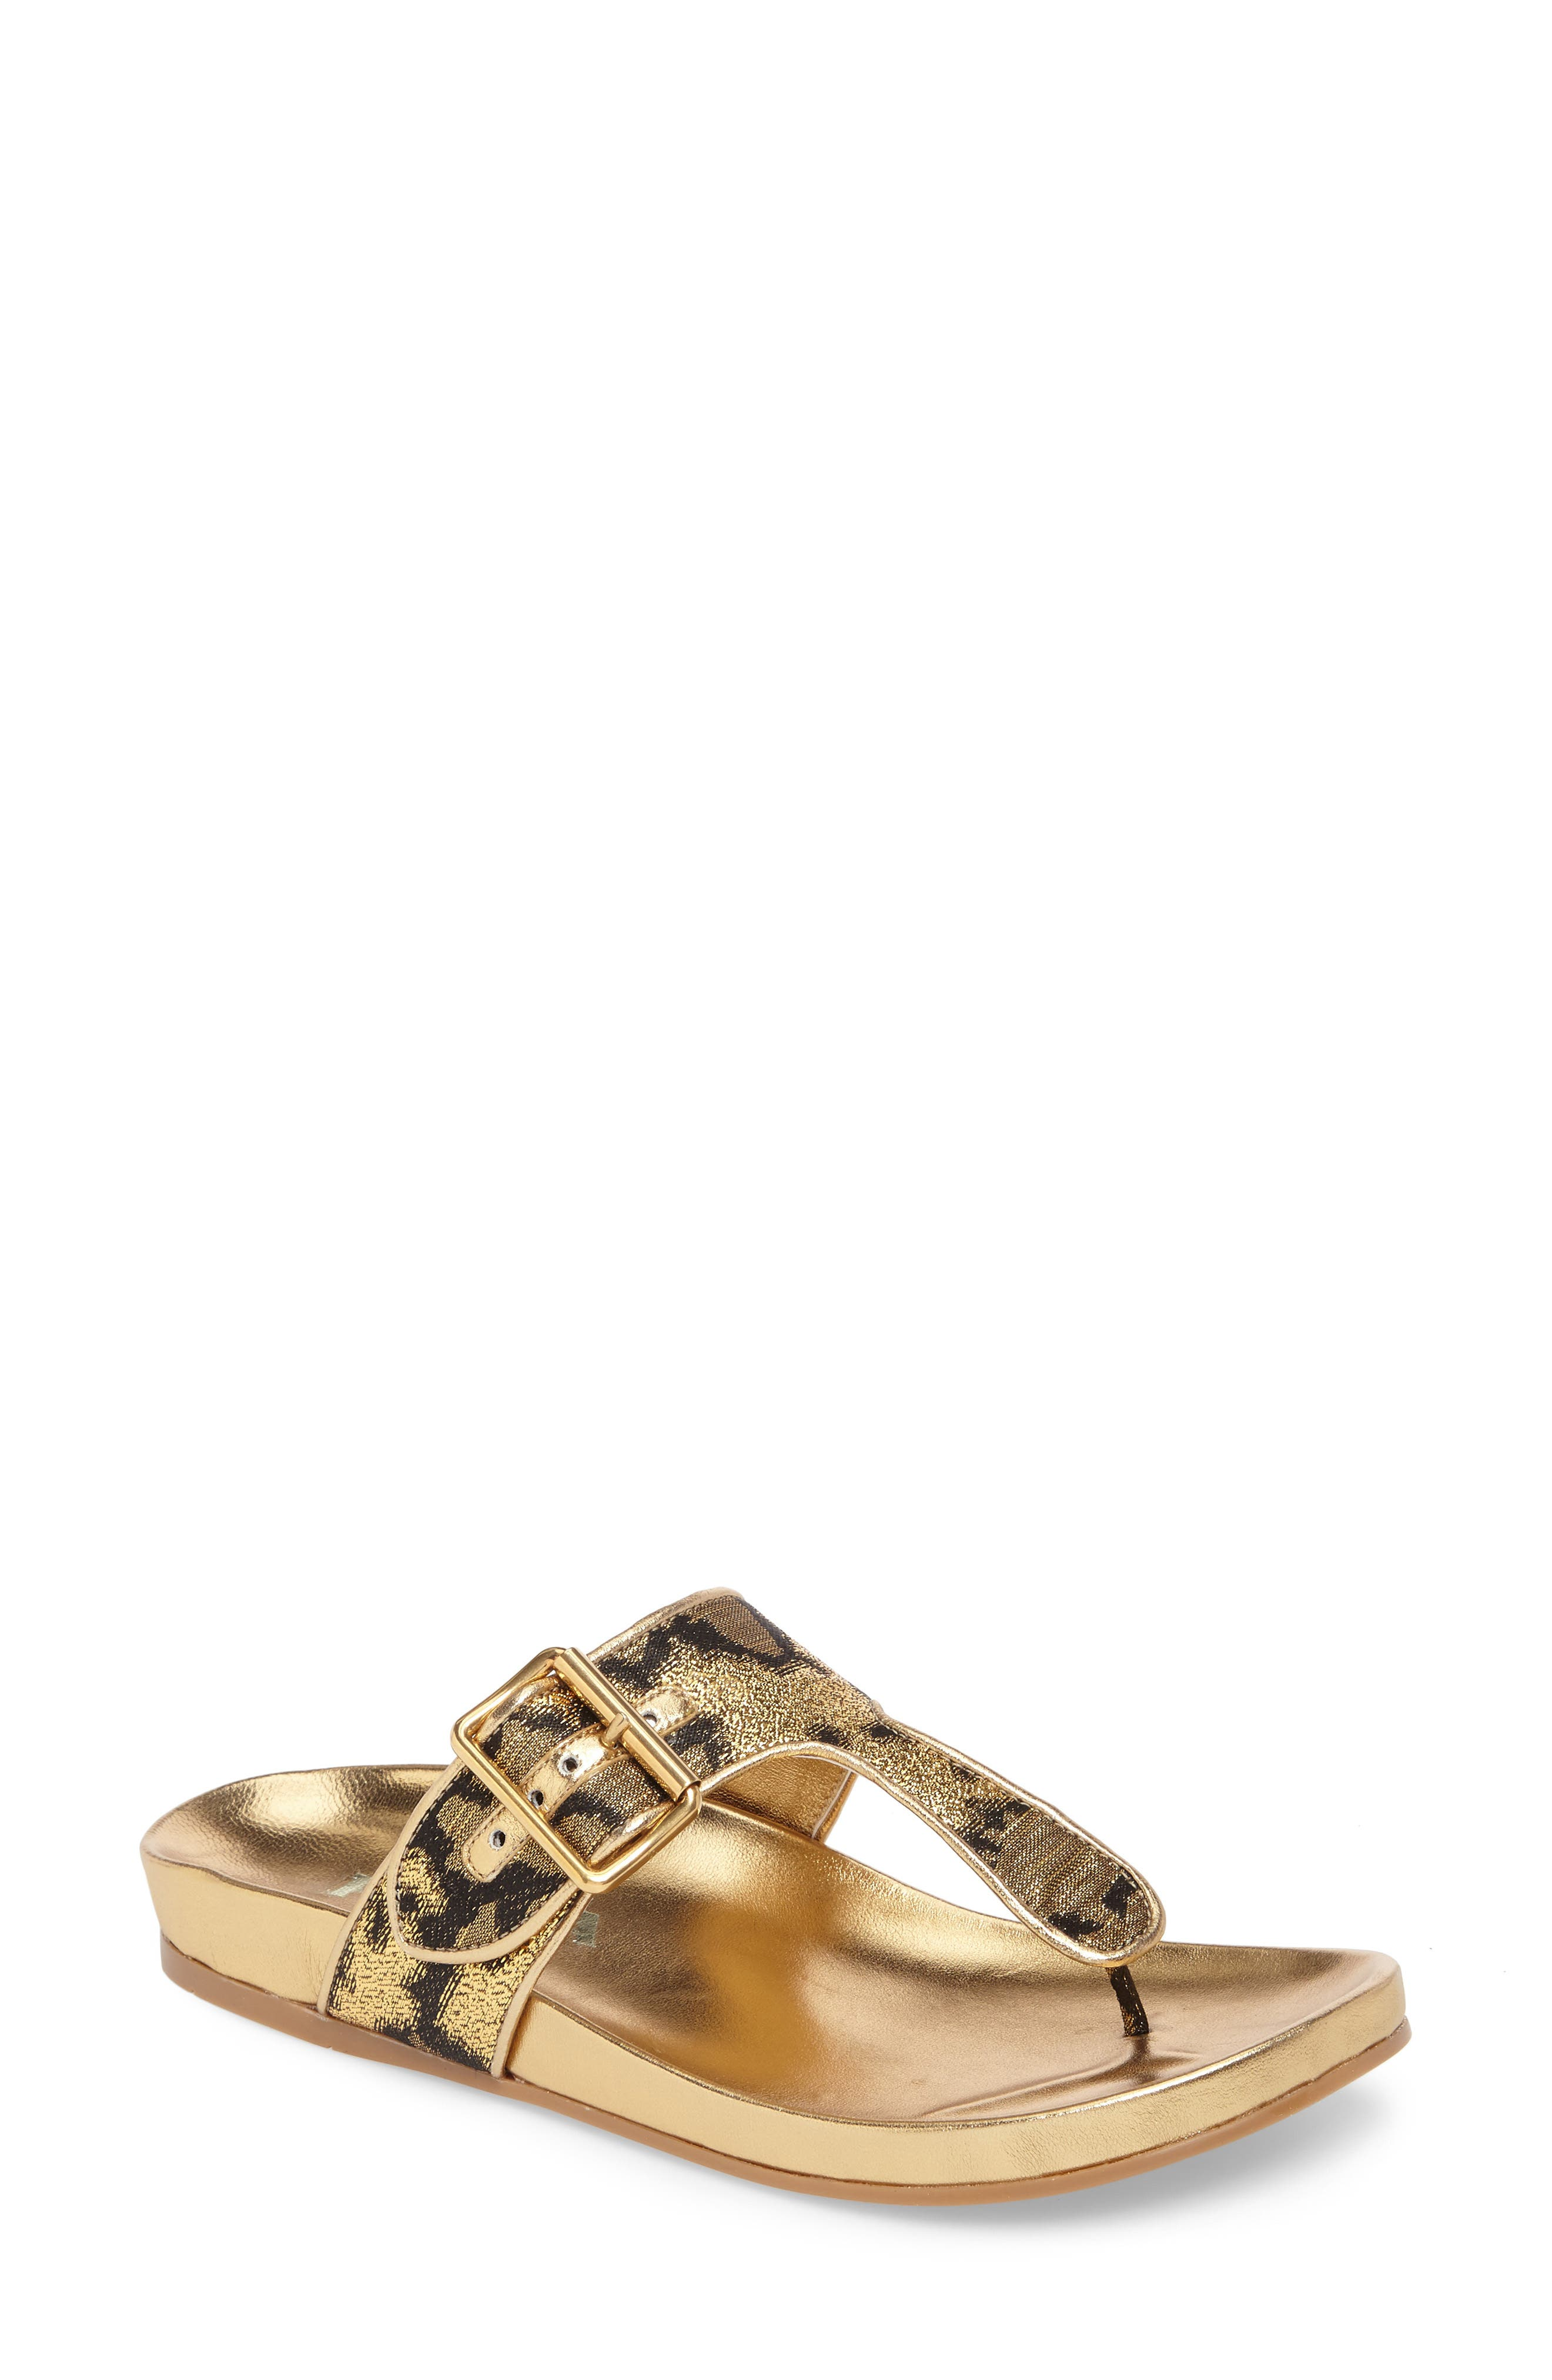 Prada Glitter Thong Sandal (Women)